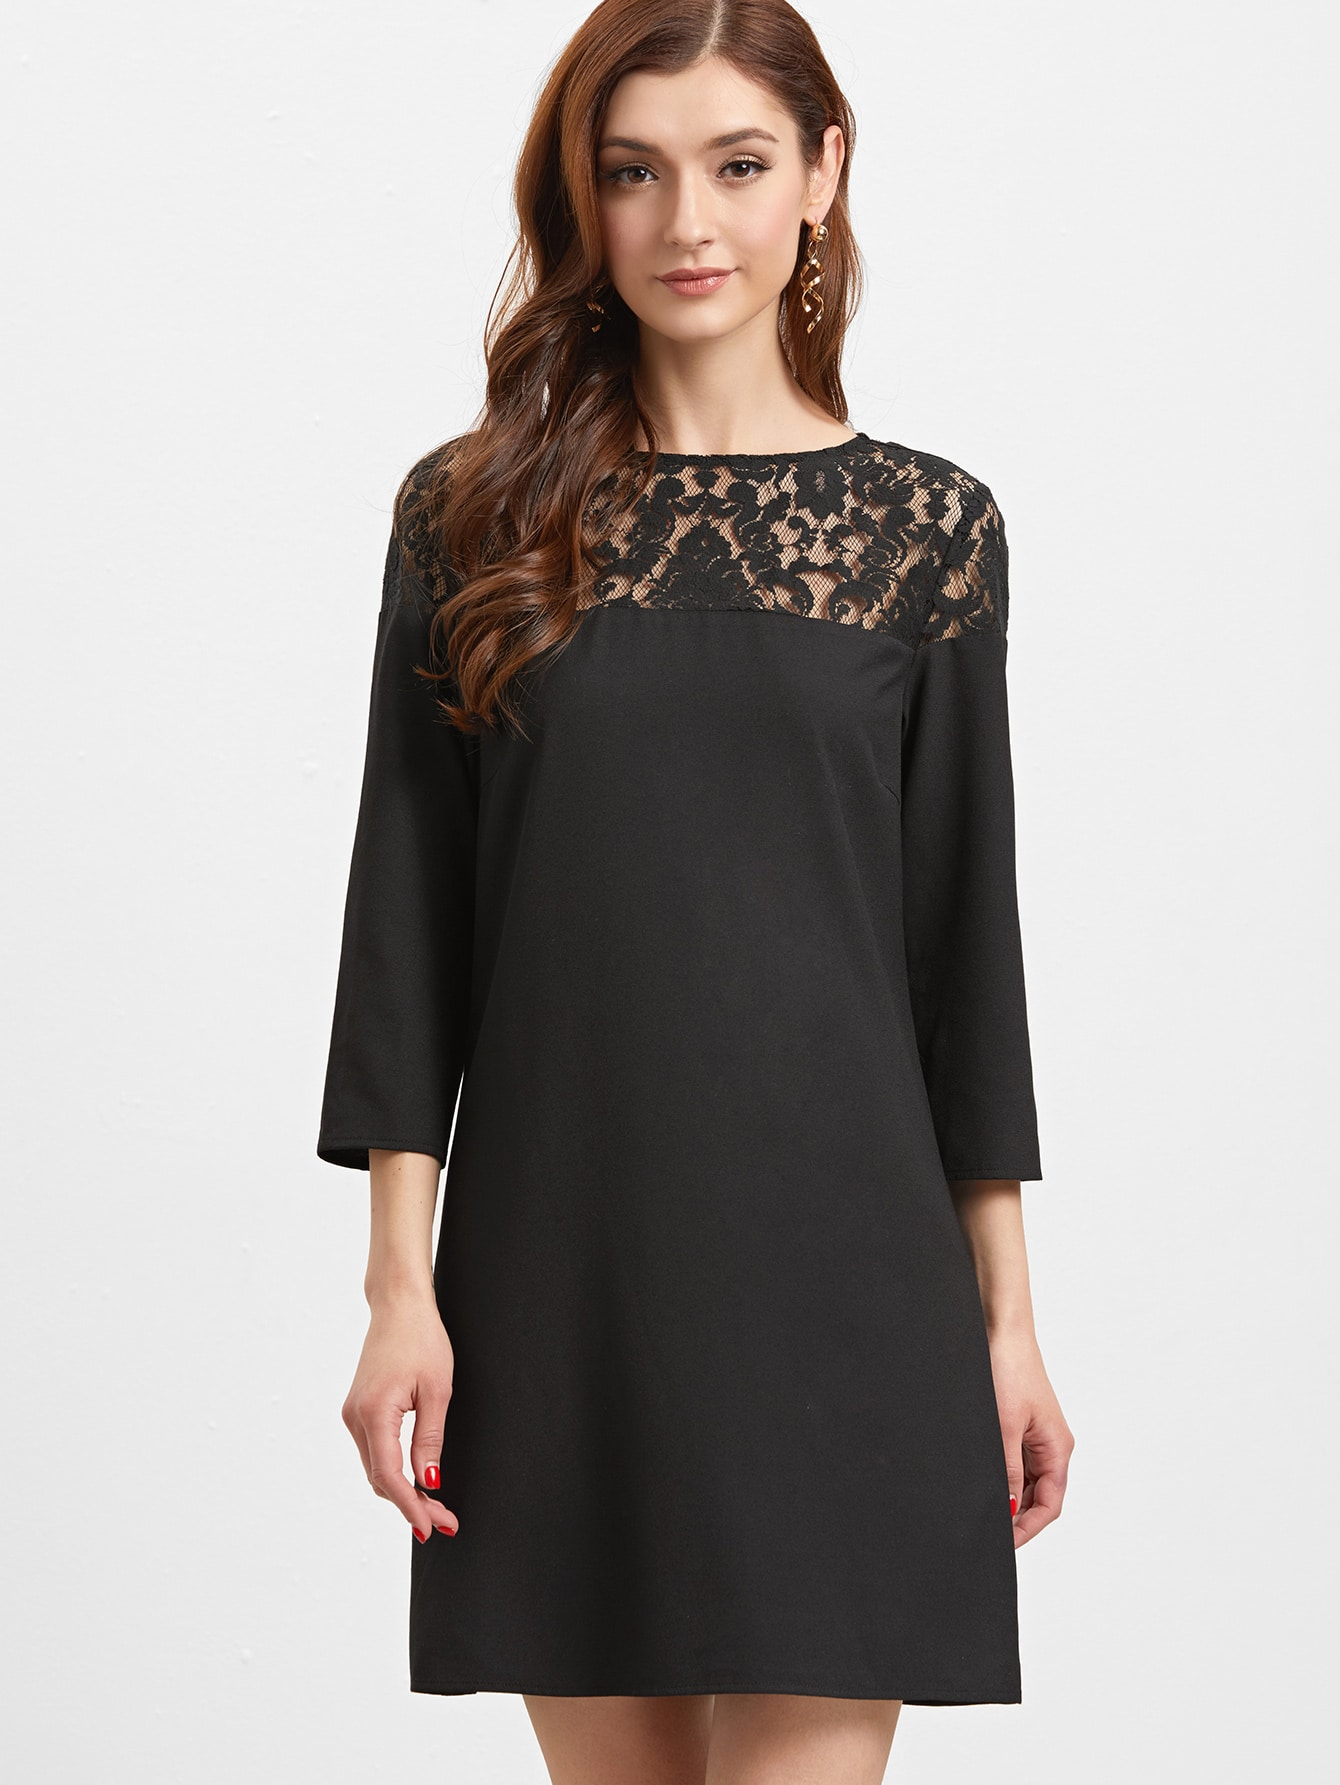 Black Sheer Floral Lace Yoke Buttoned Keyhole Tunic Dress ...